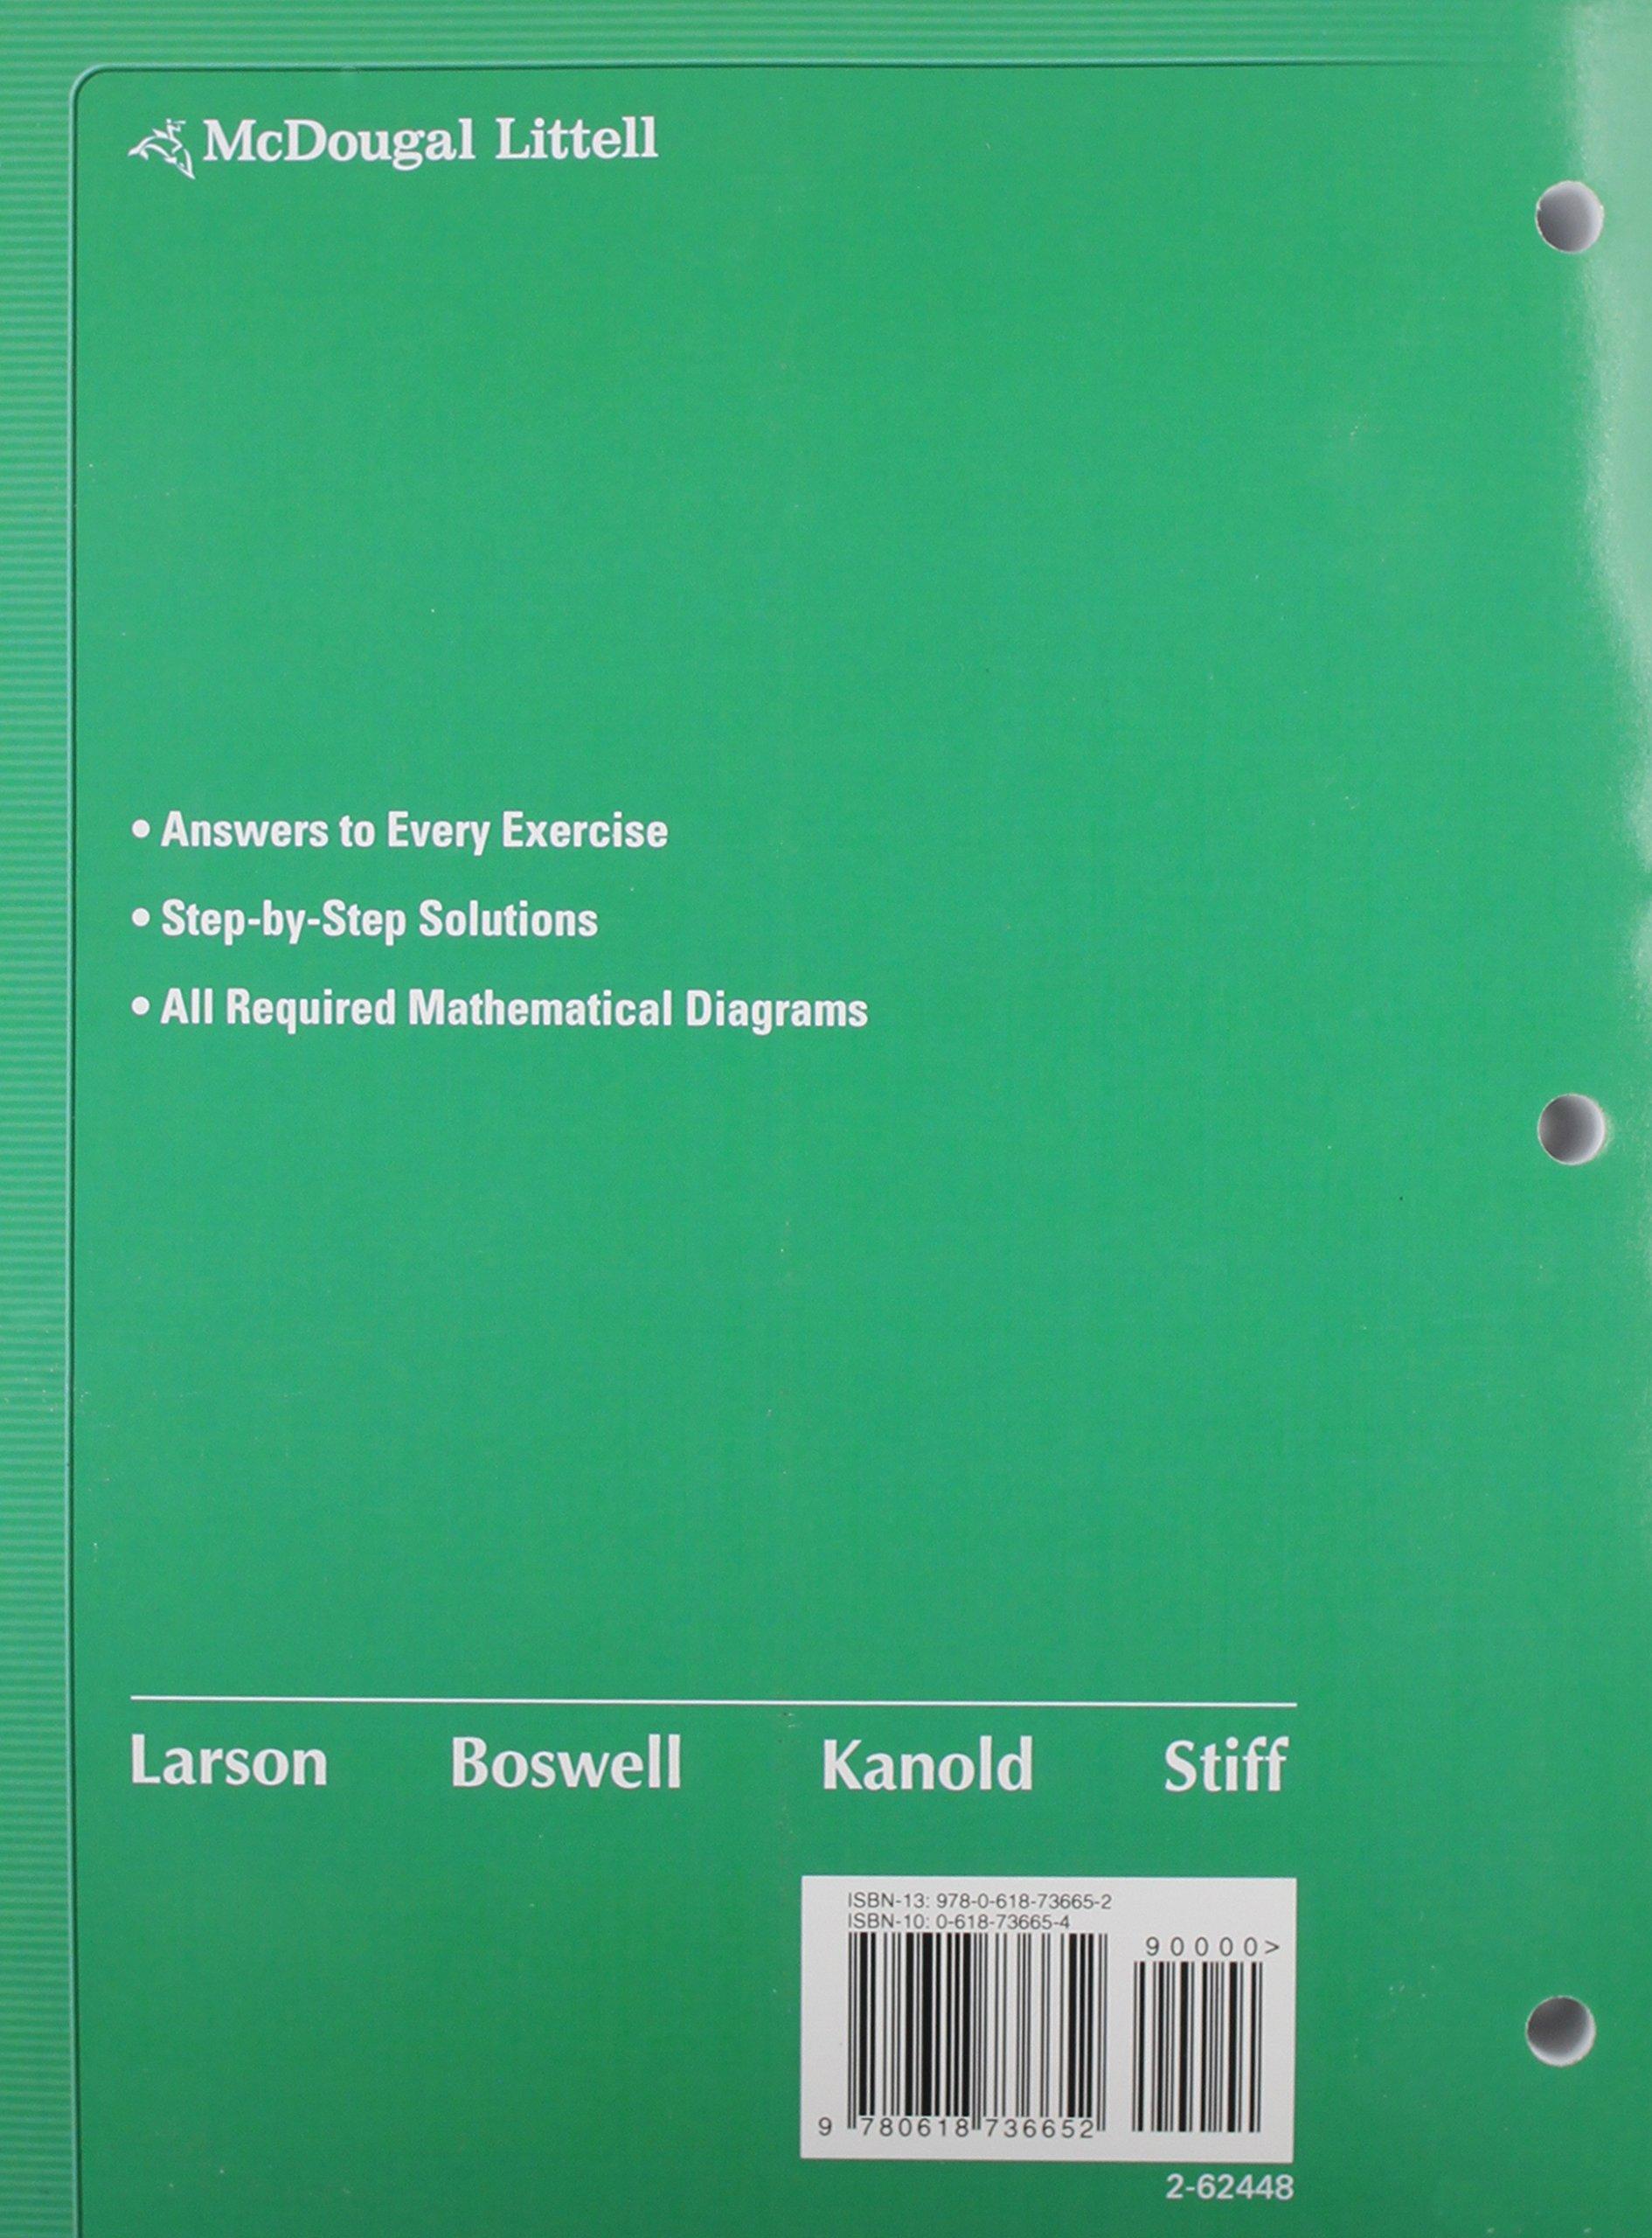 Amazon.com: Holt McDougal Larson Algebra 2: Worked-Out Solutions Key  (9780618736652): MCDOUGAL LITTEL: Books